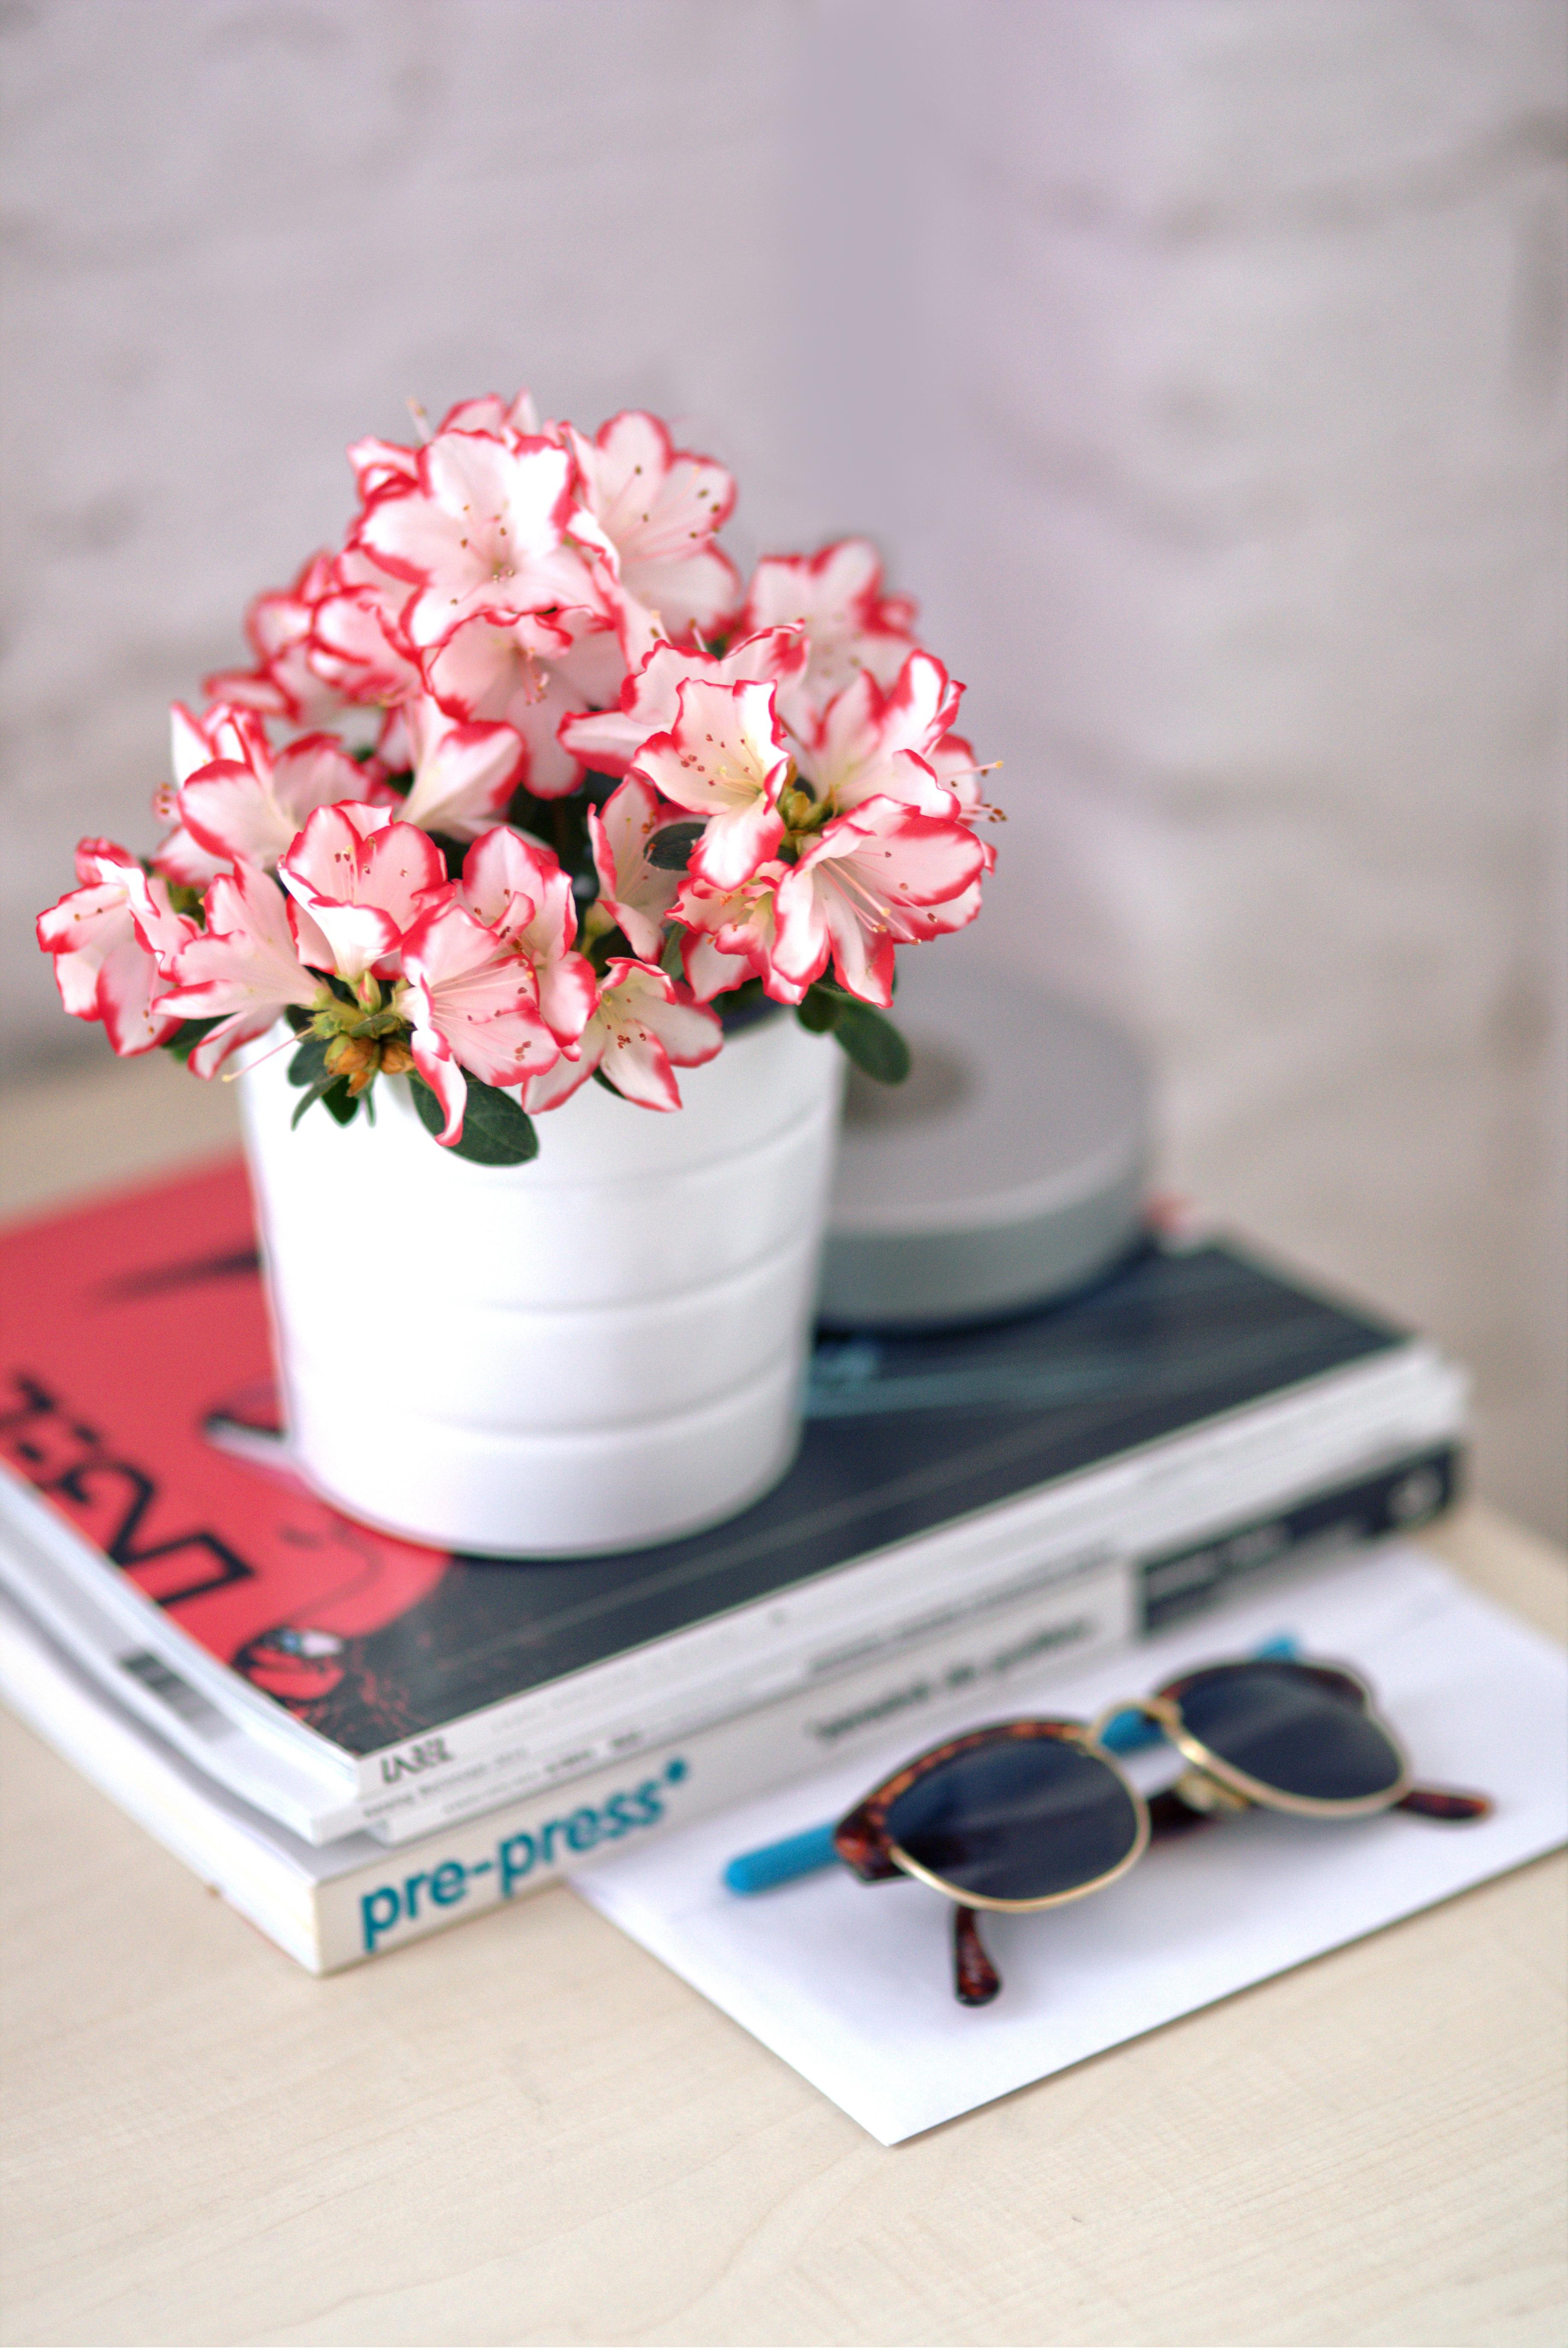 Free Images Plant Flower Petal Interior Spring Pink Art